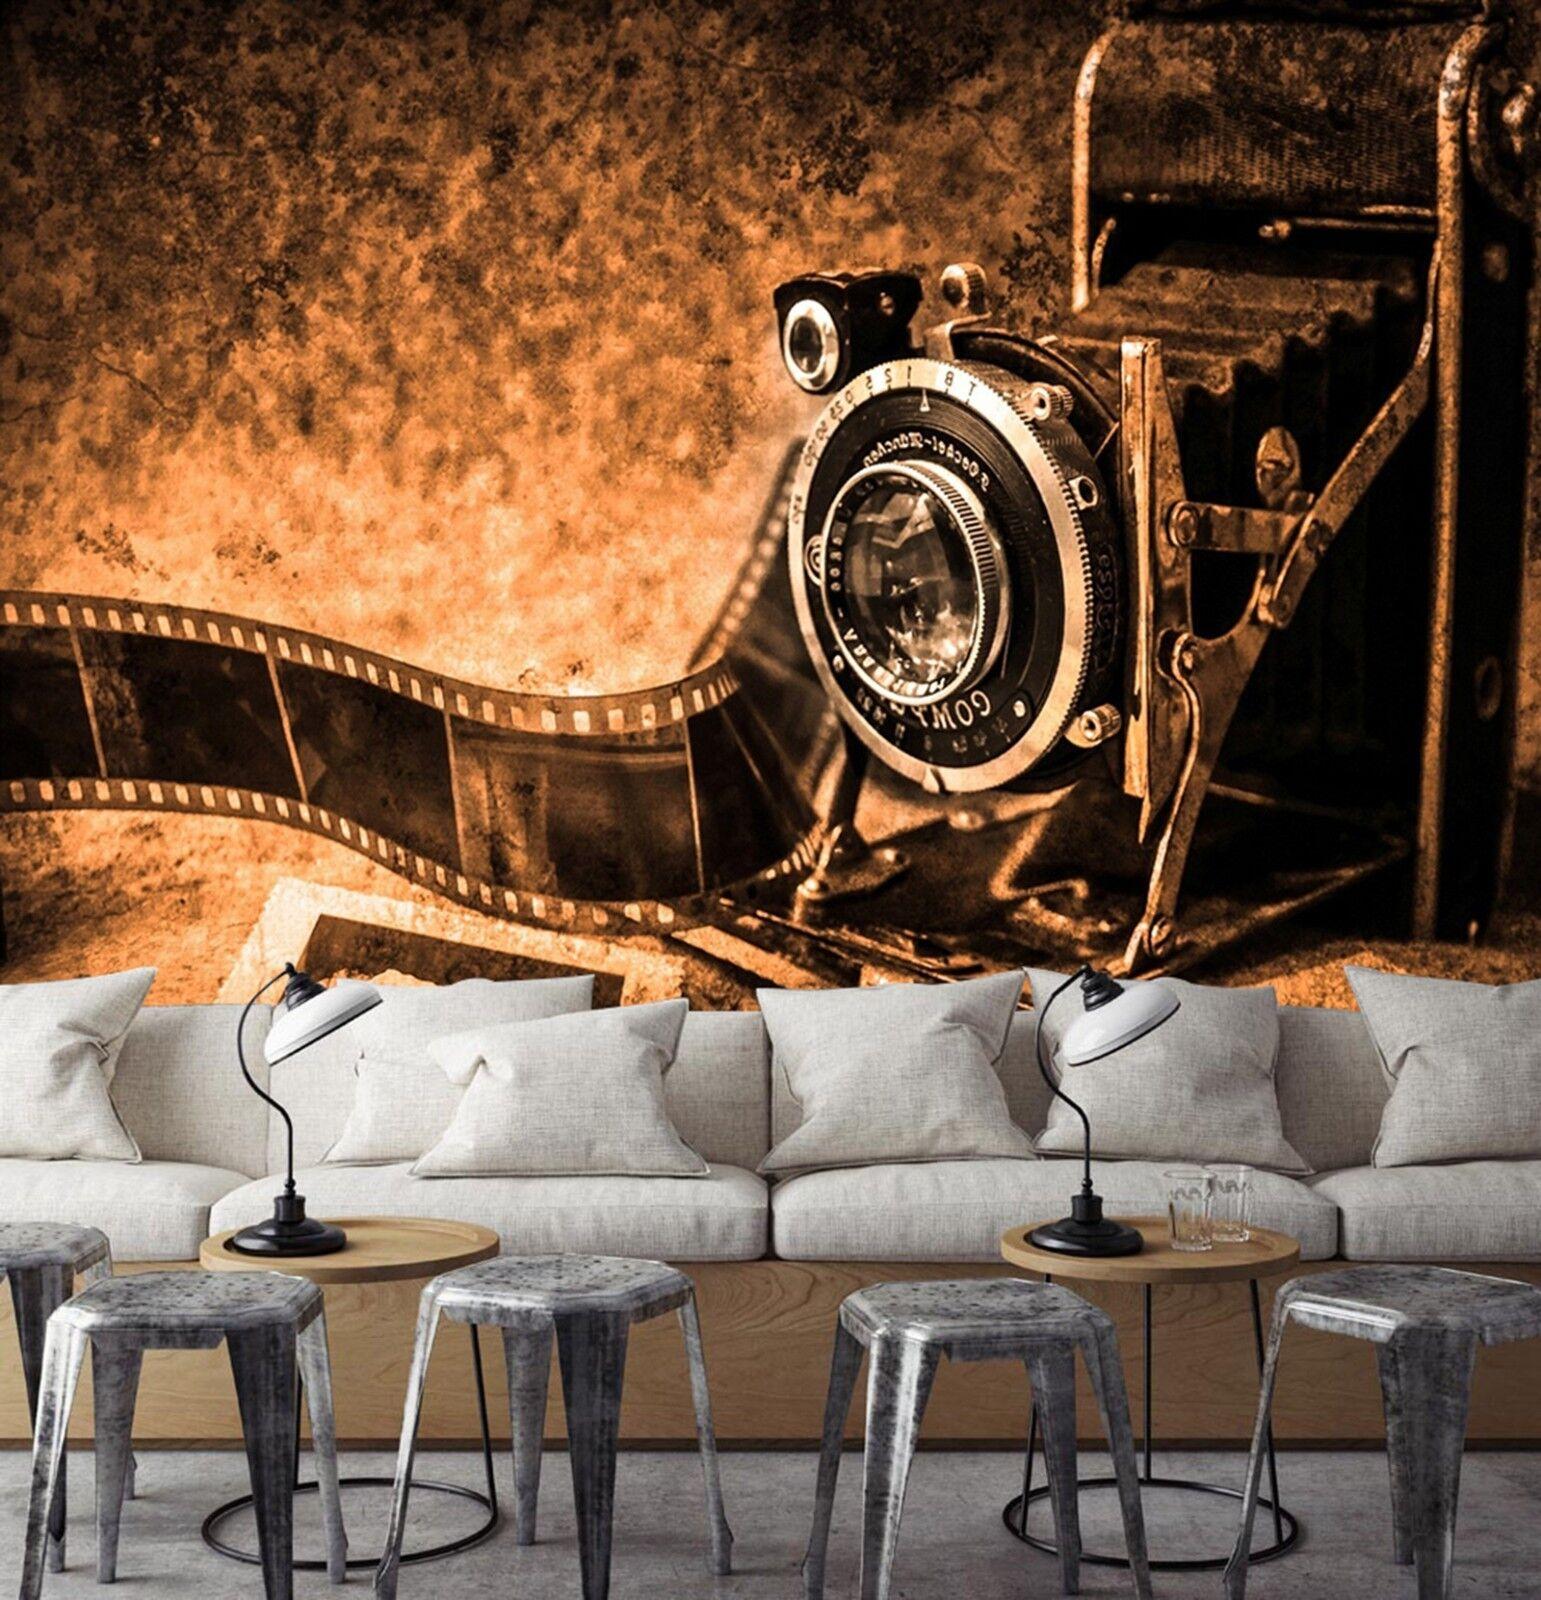 3D Film Muster Kunst 899 Tapete Wandgemälde Tapeten Bild Familie DE Lemon | Erste Klasse in seiner Klasse  | Qualität und Verbraucher an erster Stelle  | New Listing